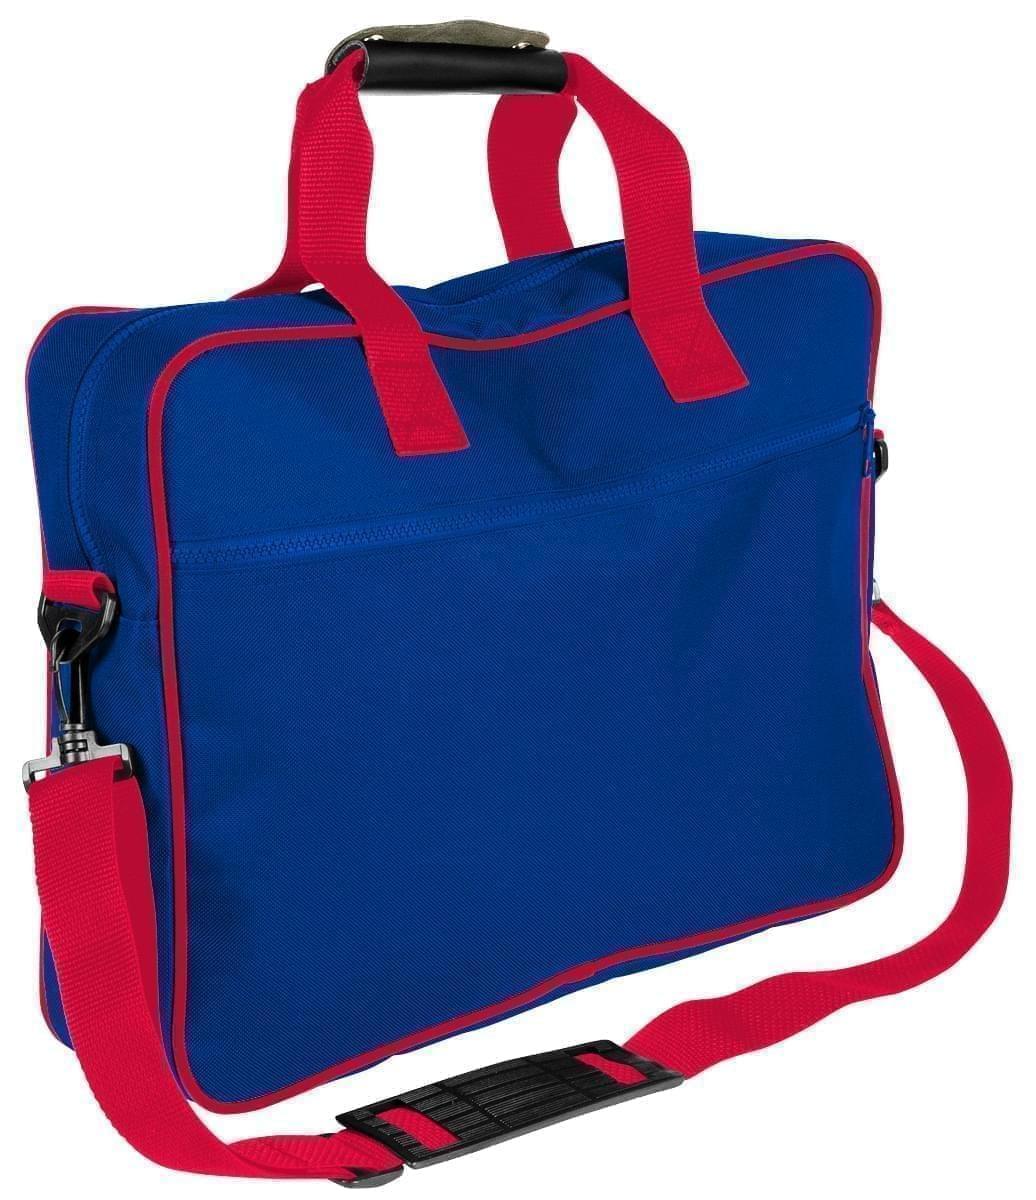 USA Made Nylon Poly Notebook Sleeves, Royal Blue-Red, CPKVA59P02